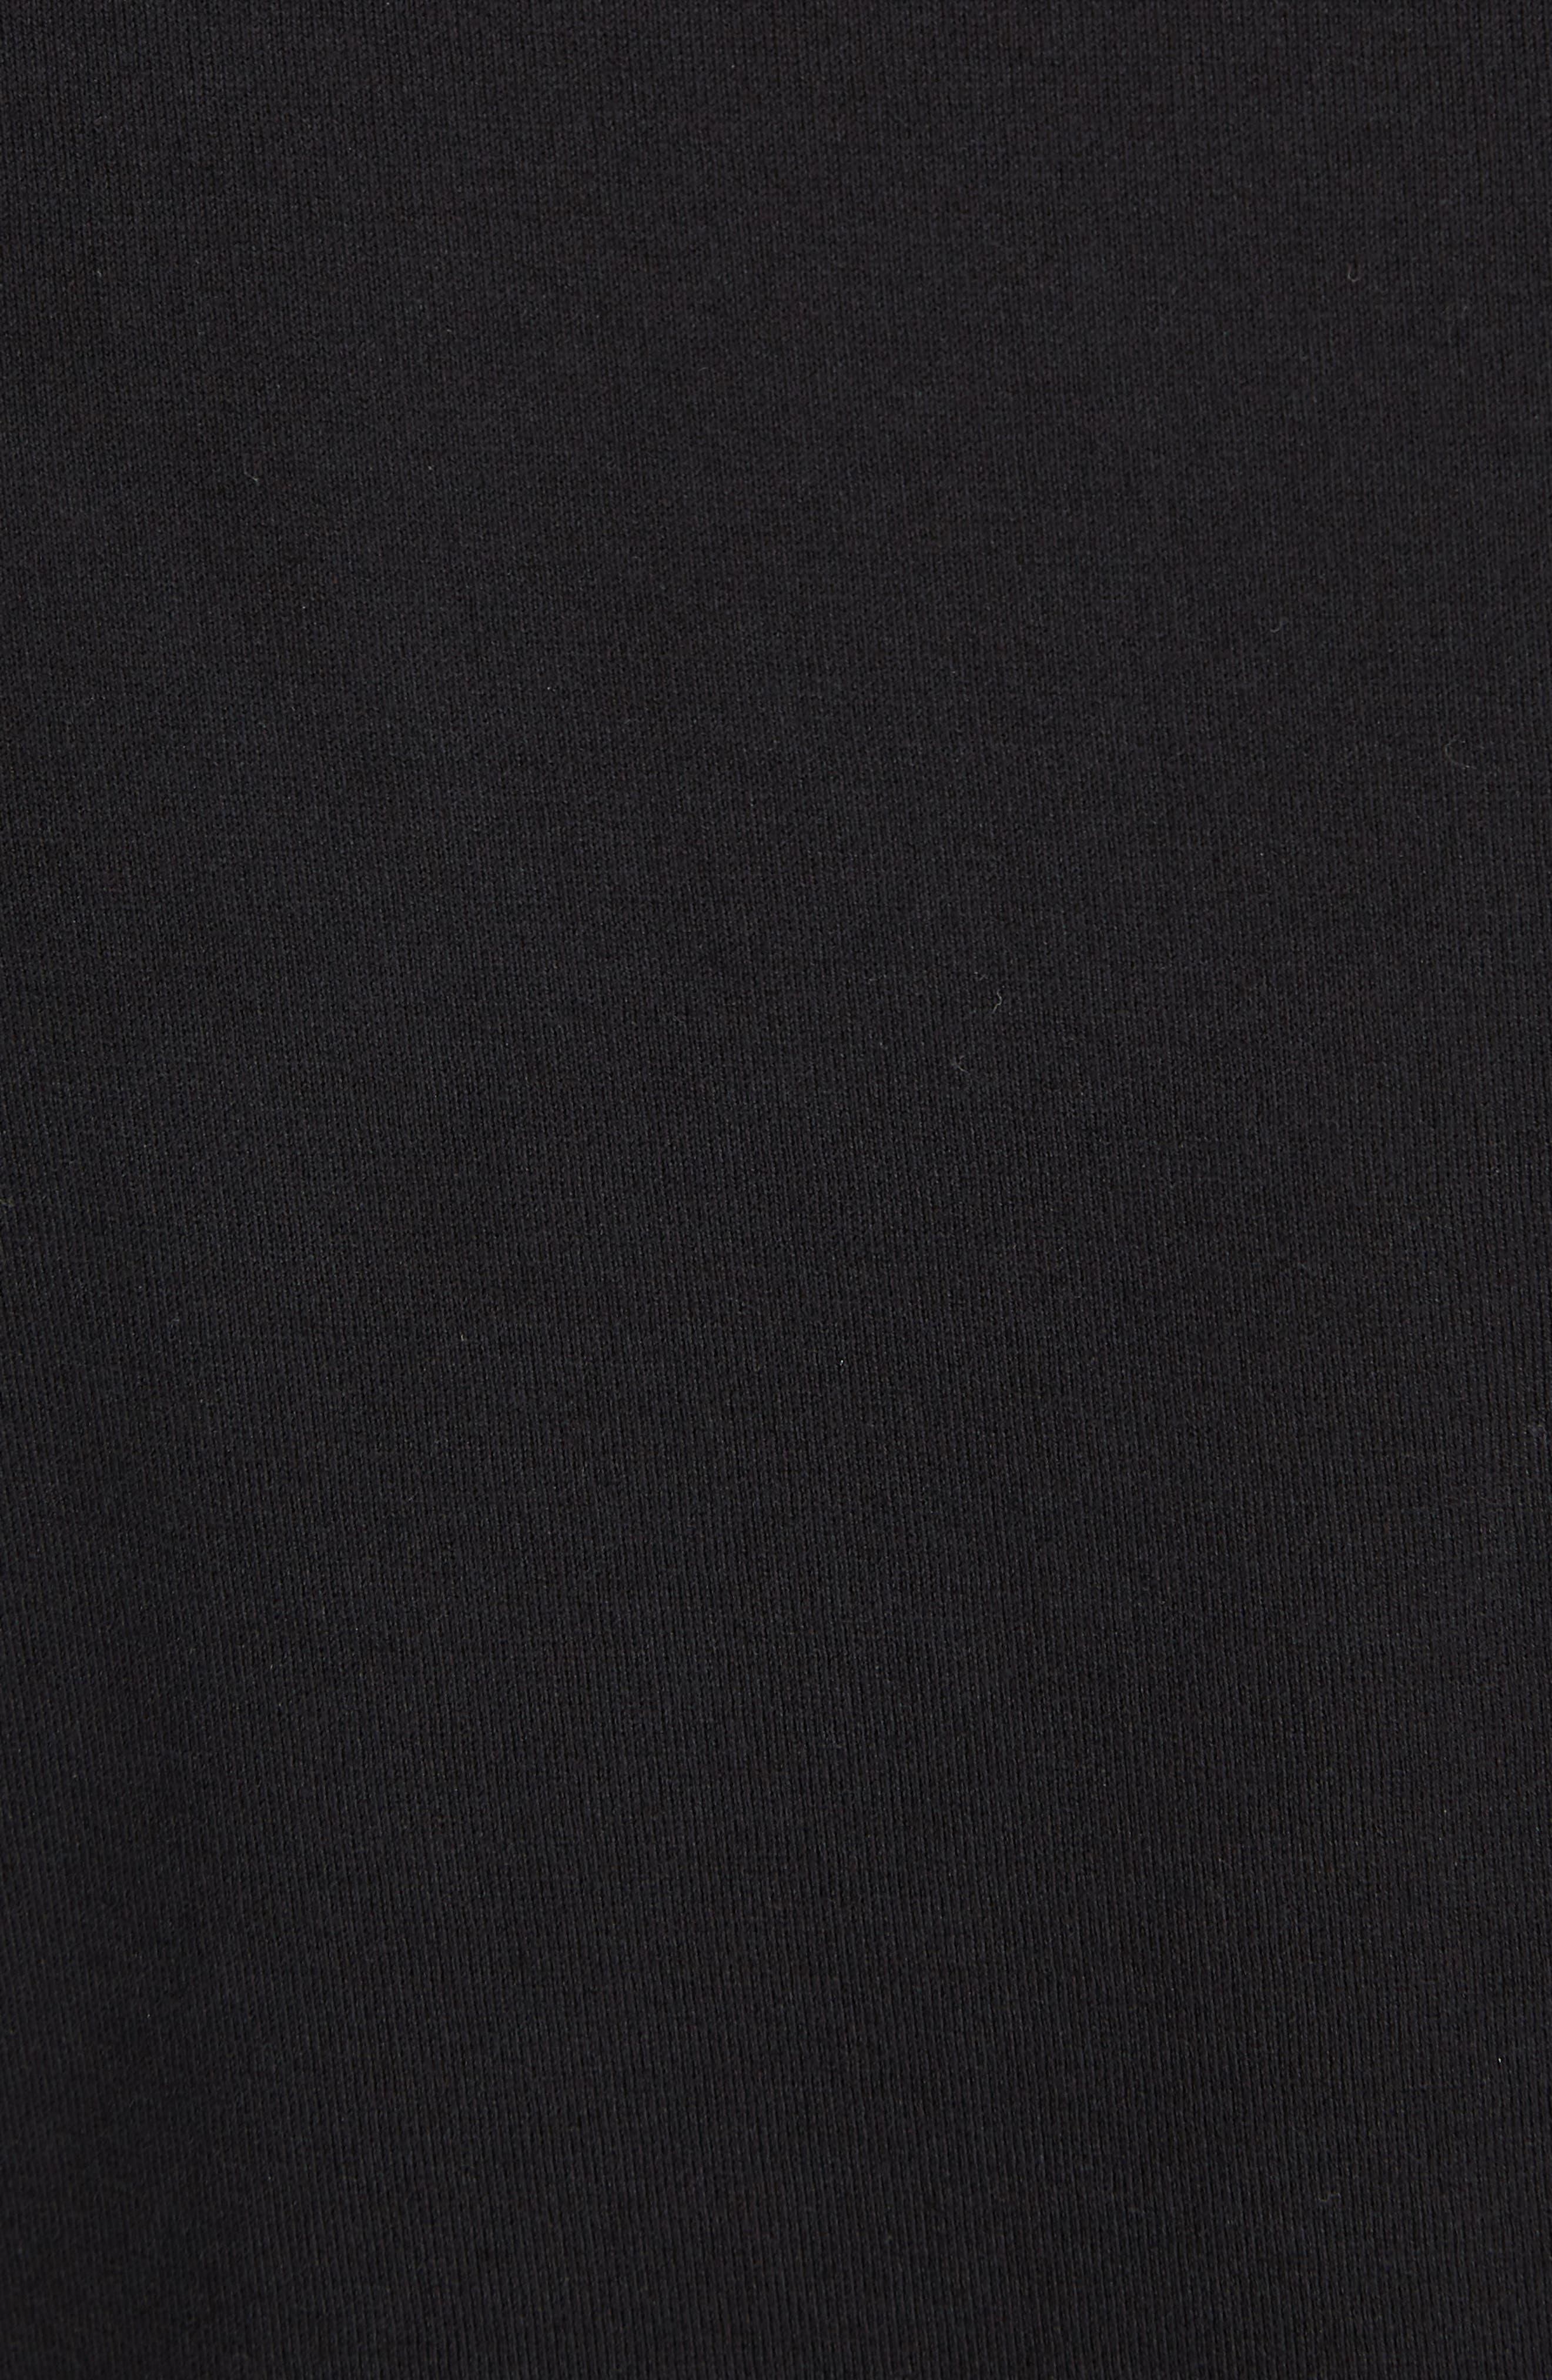 Jewel Print Crewneck T-Shirt,                             Alternate thumbnail 5, color,